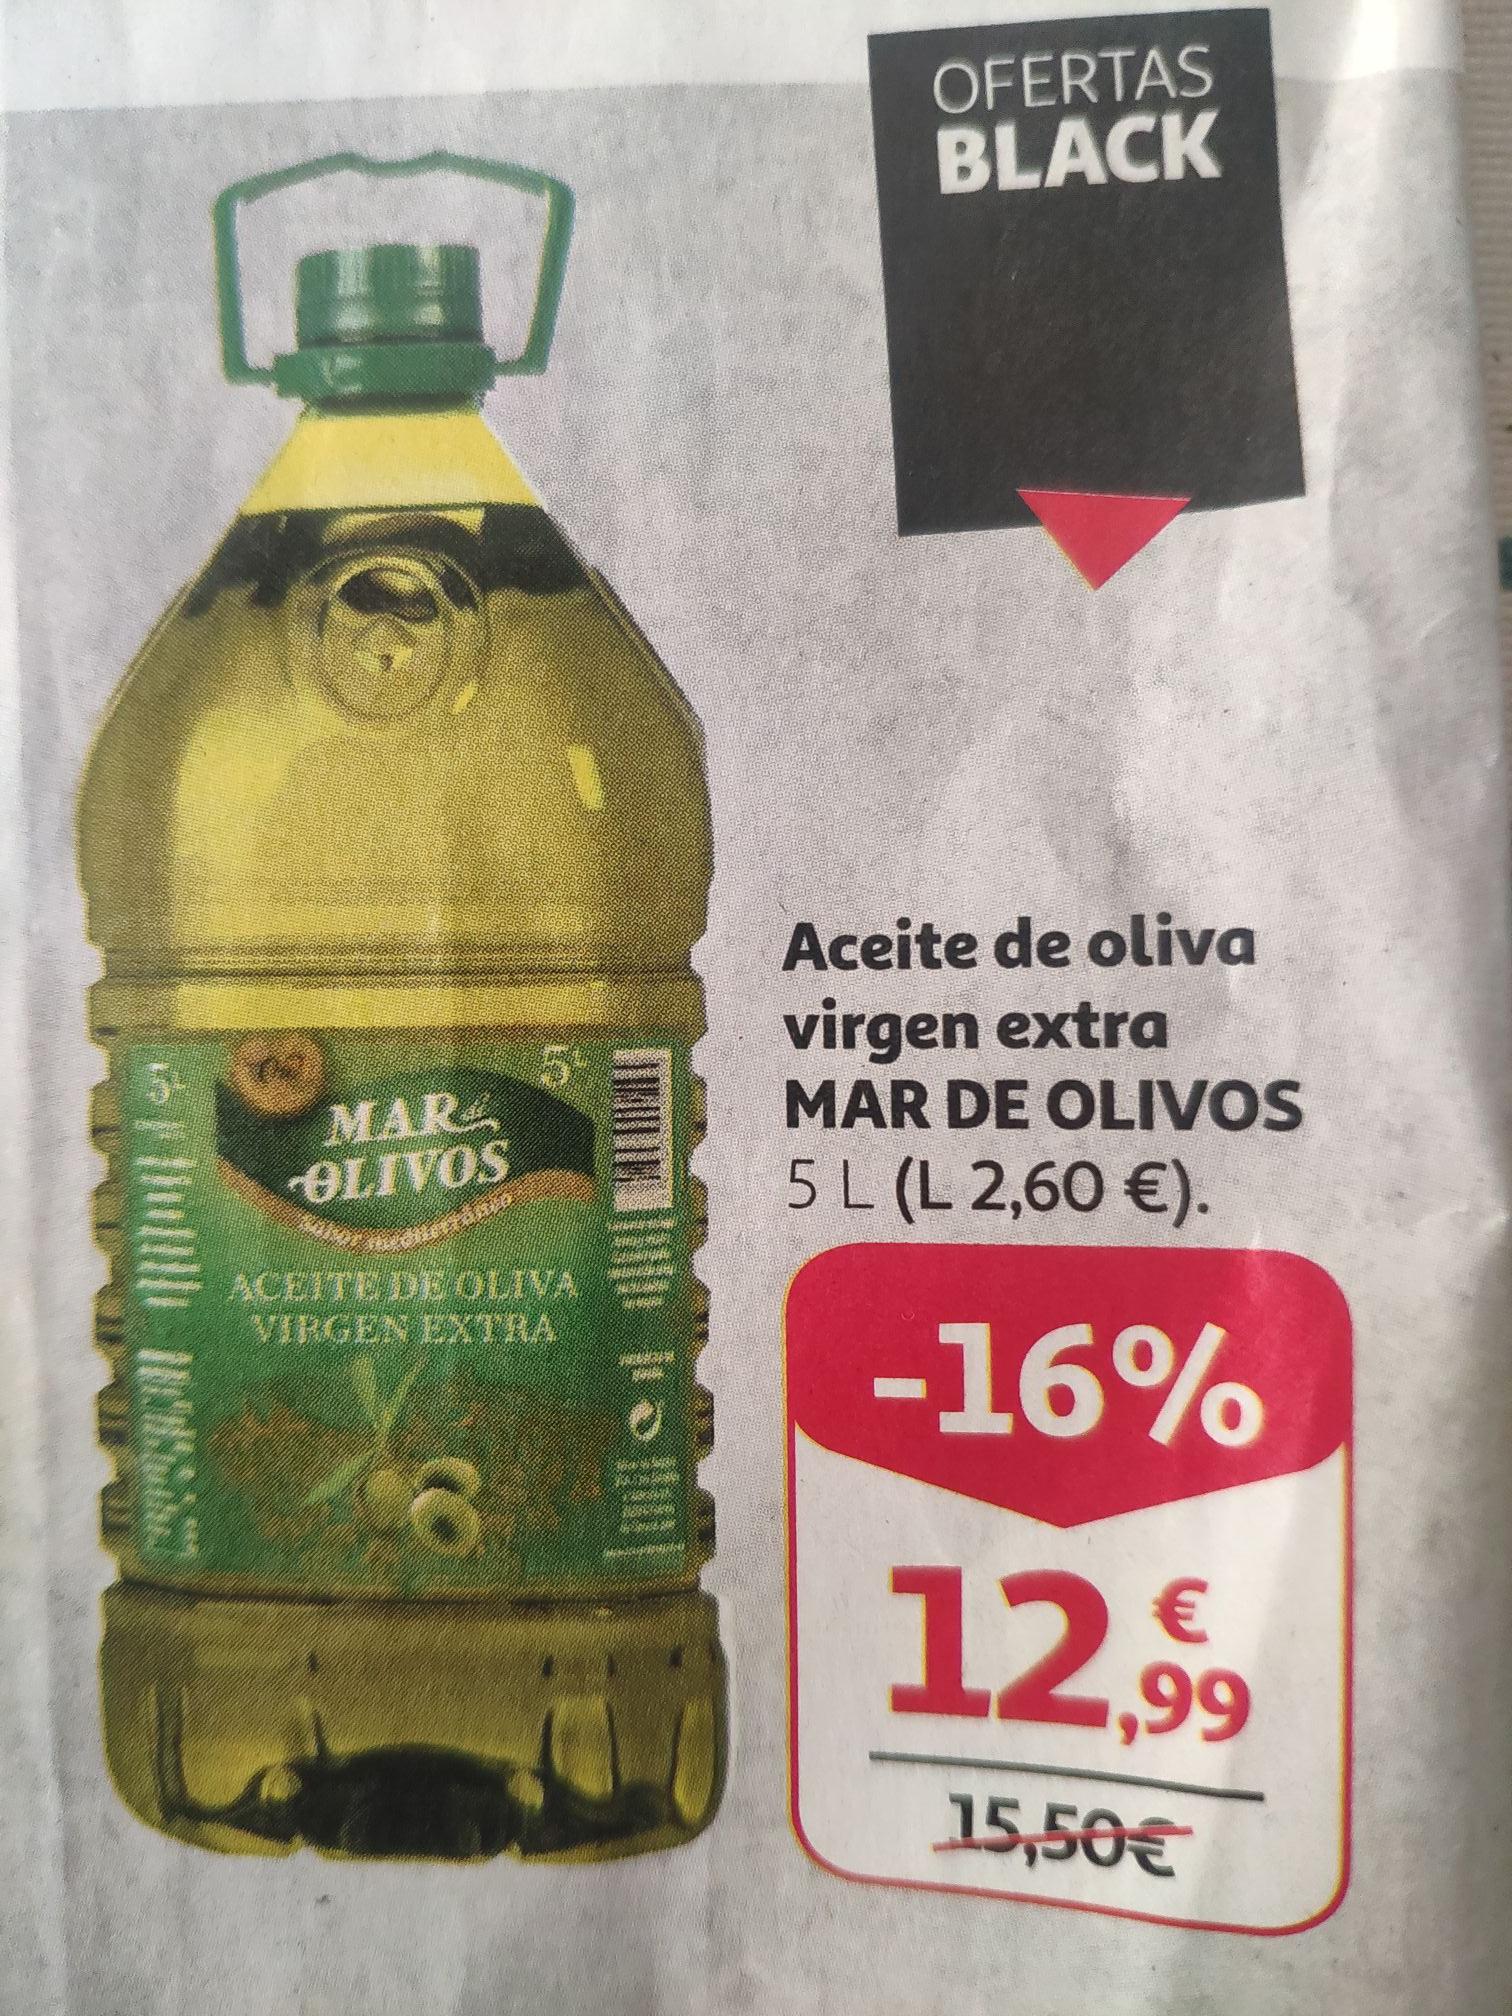 Aceite de oliva virgen extra MAR DE OLIVOS garrafa de 5 l.